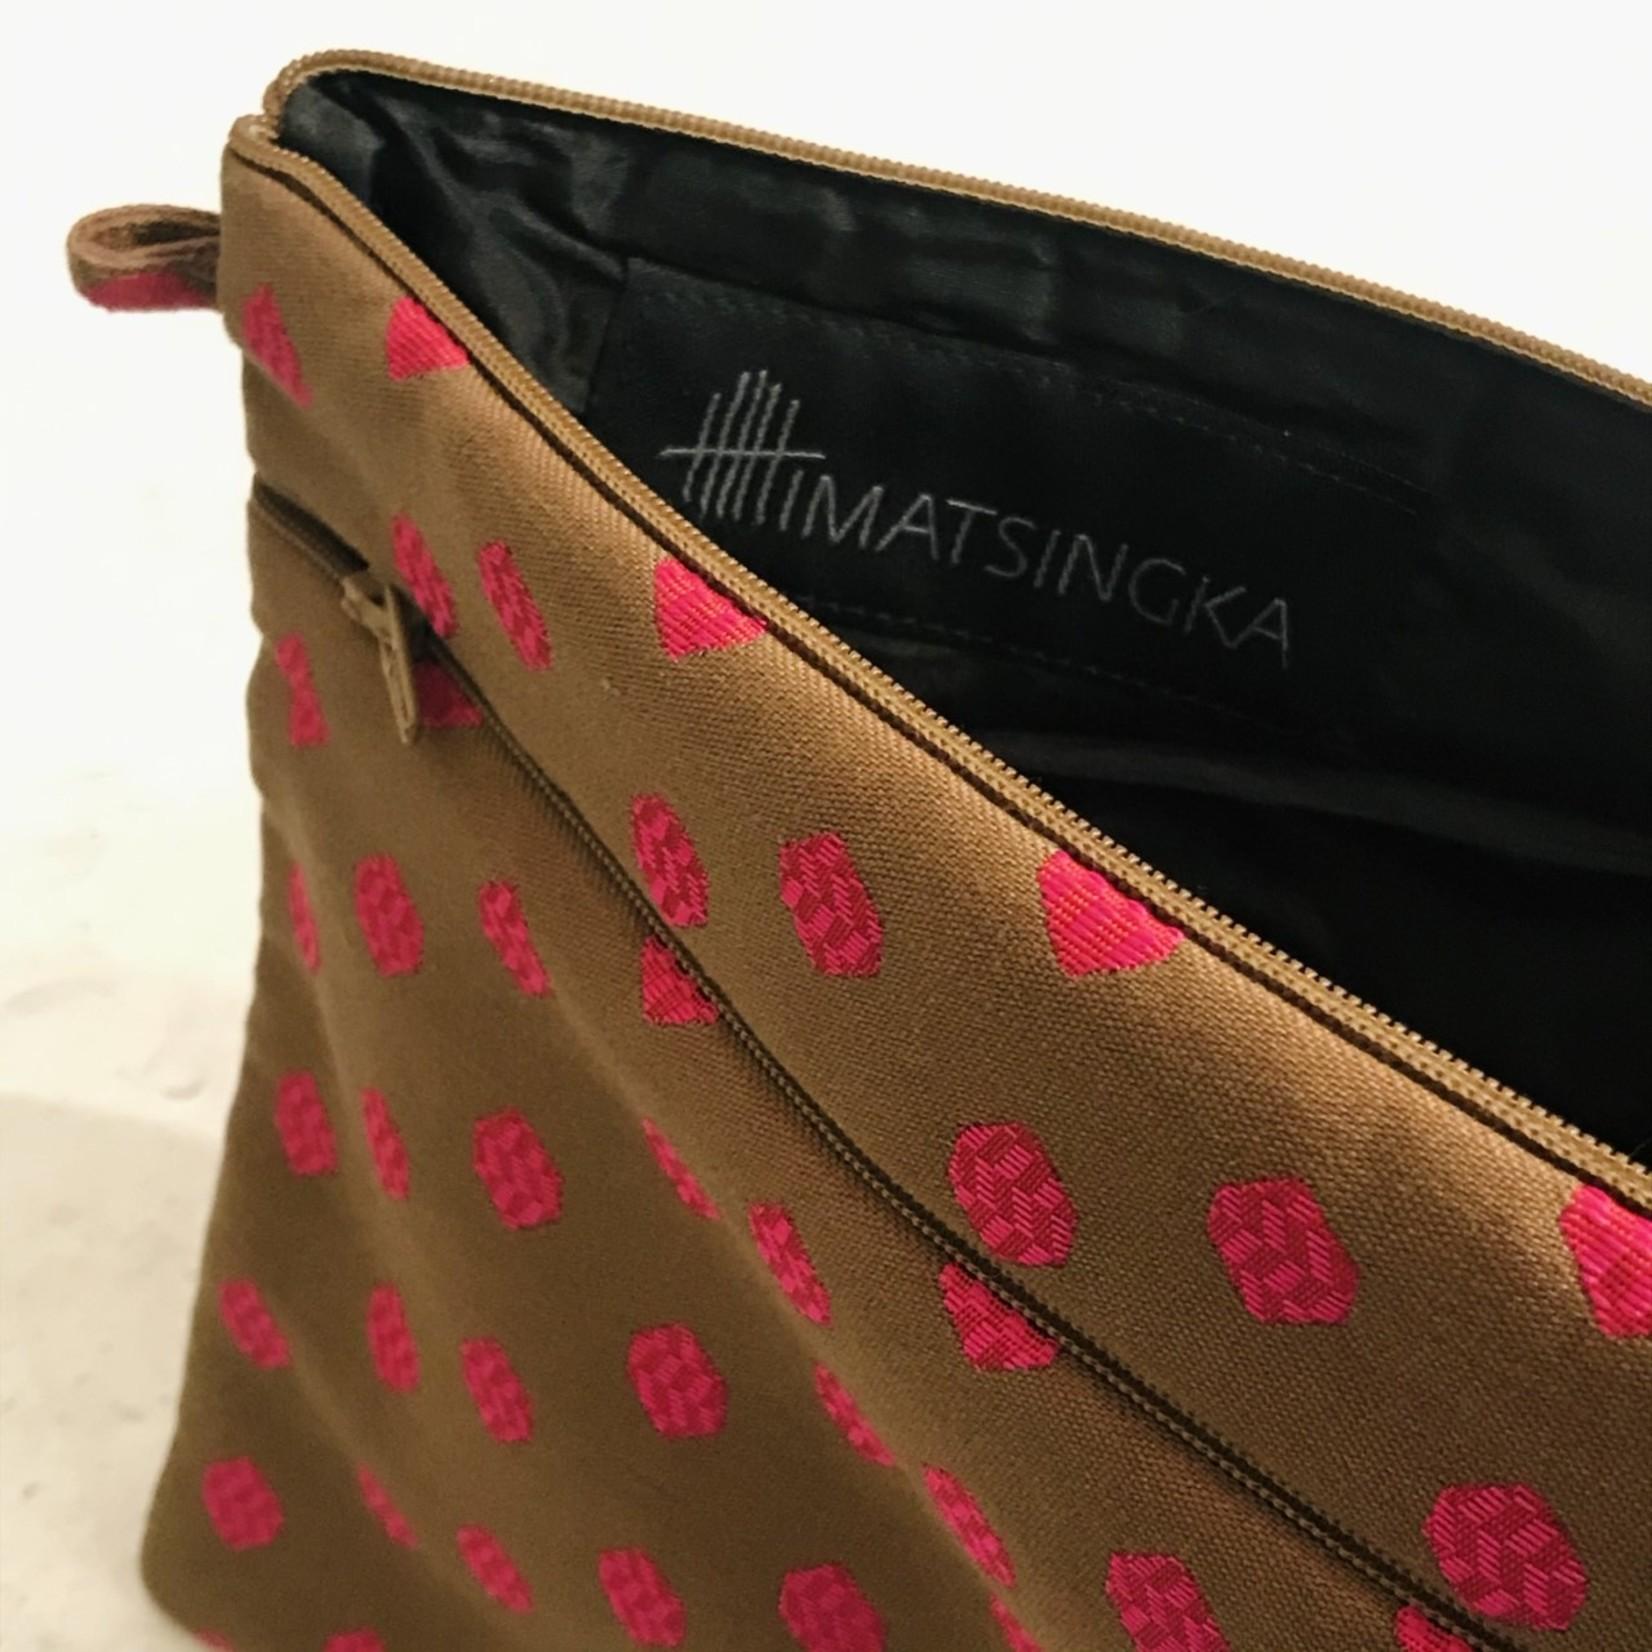 Himatsingka Himatsingka Pouch- Extra Large- Chocolate and Magenta